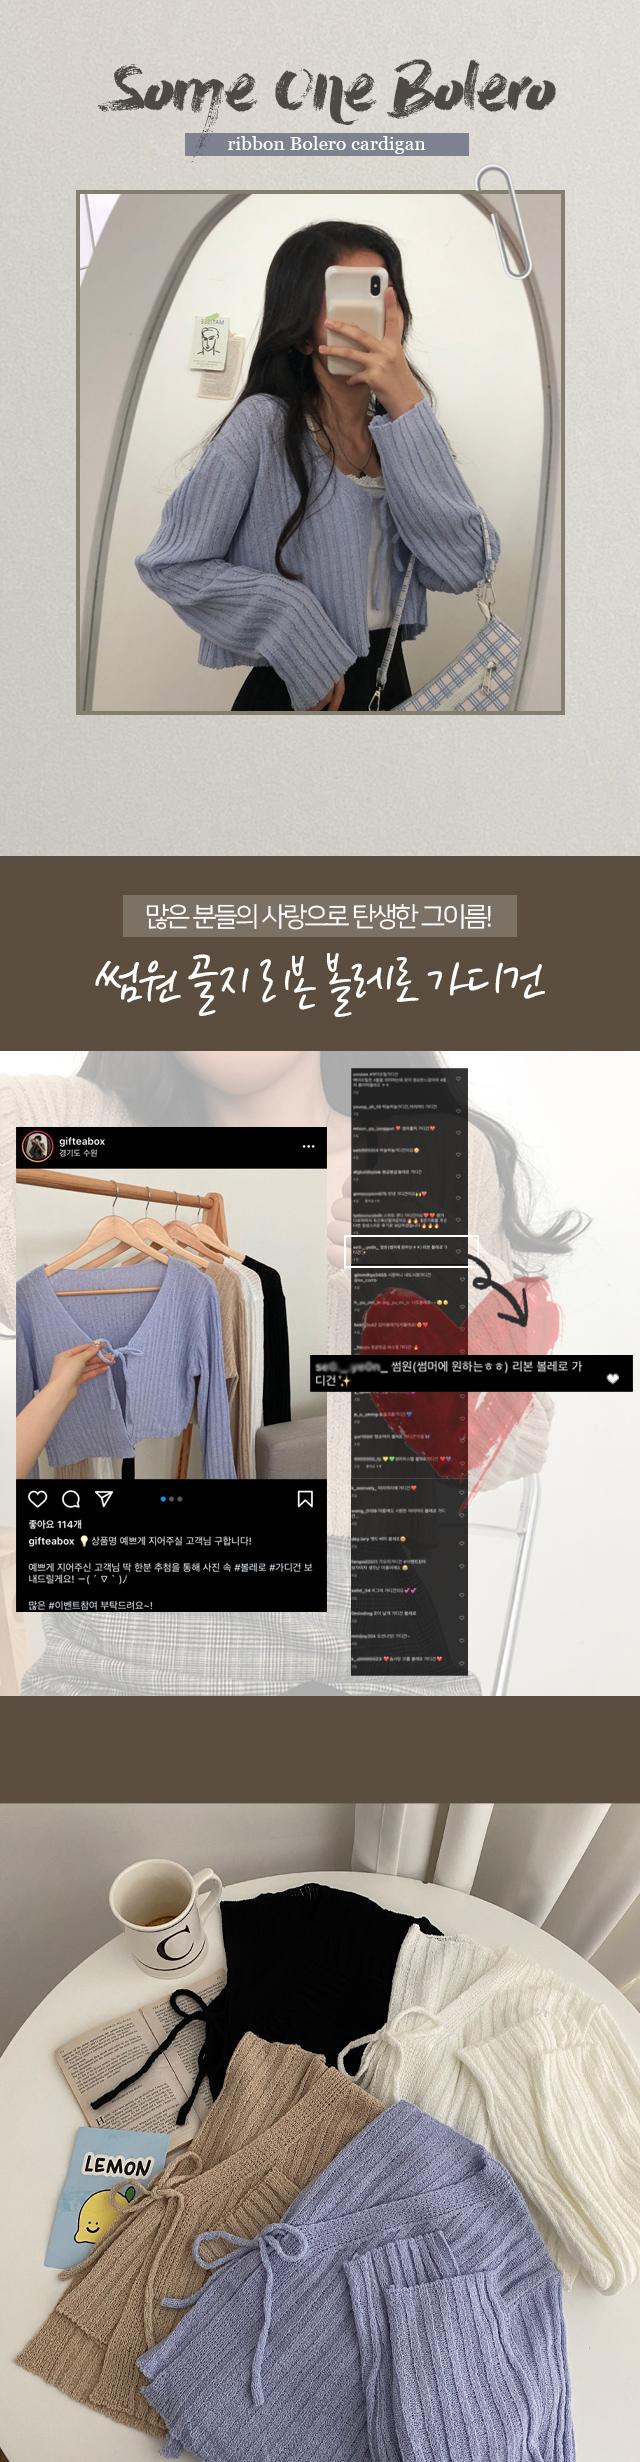 Sseomwon Ribbed ribbon bolero cardigan